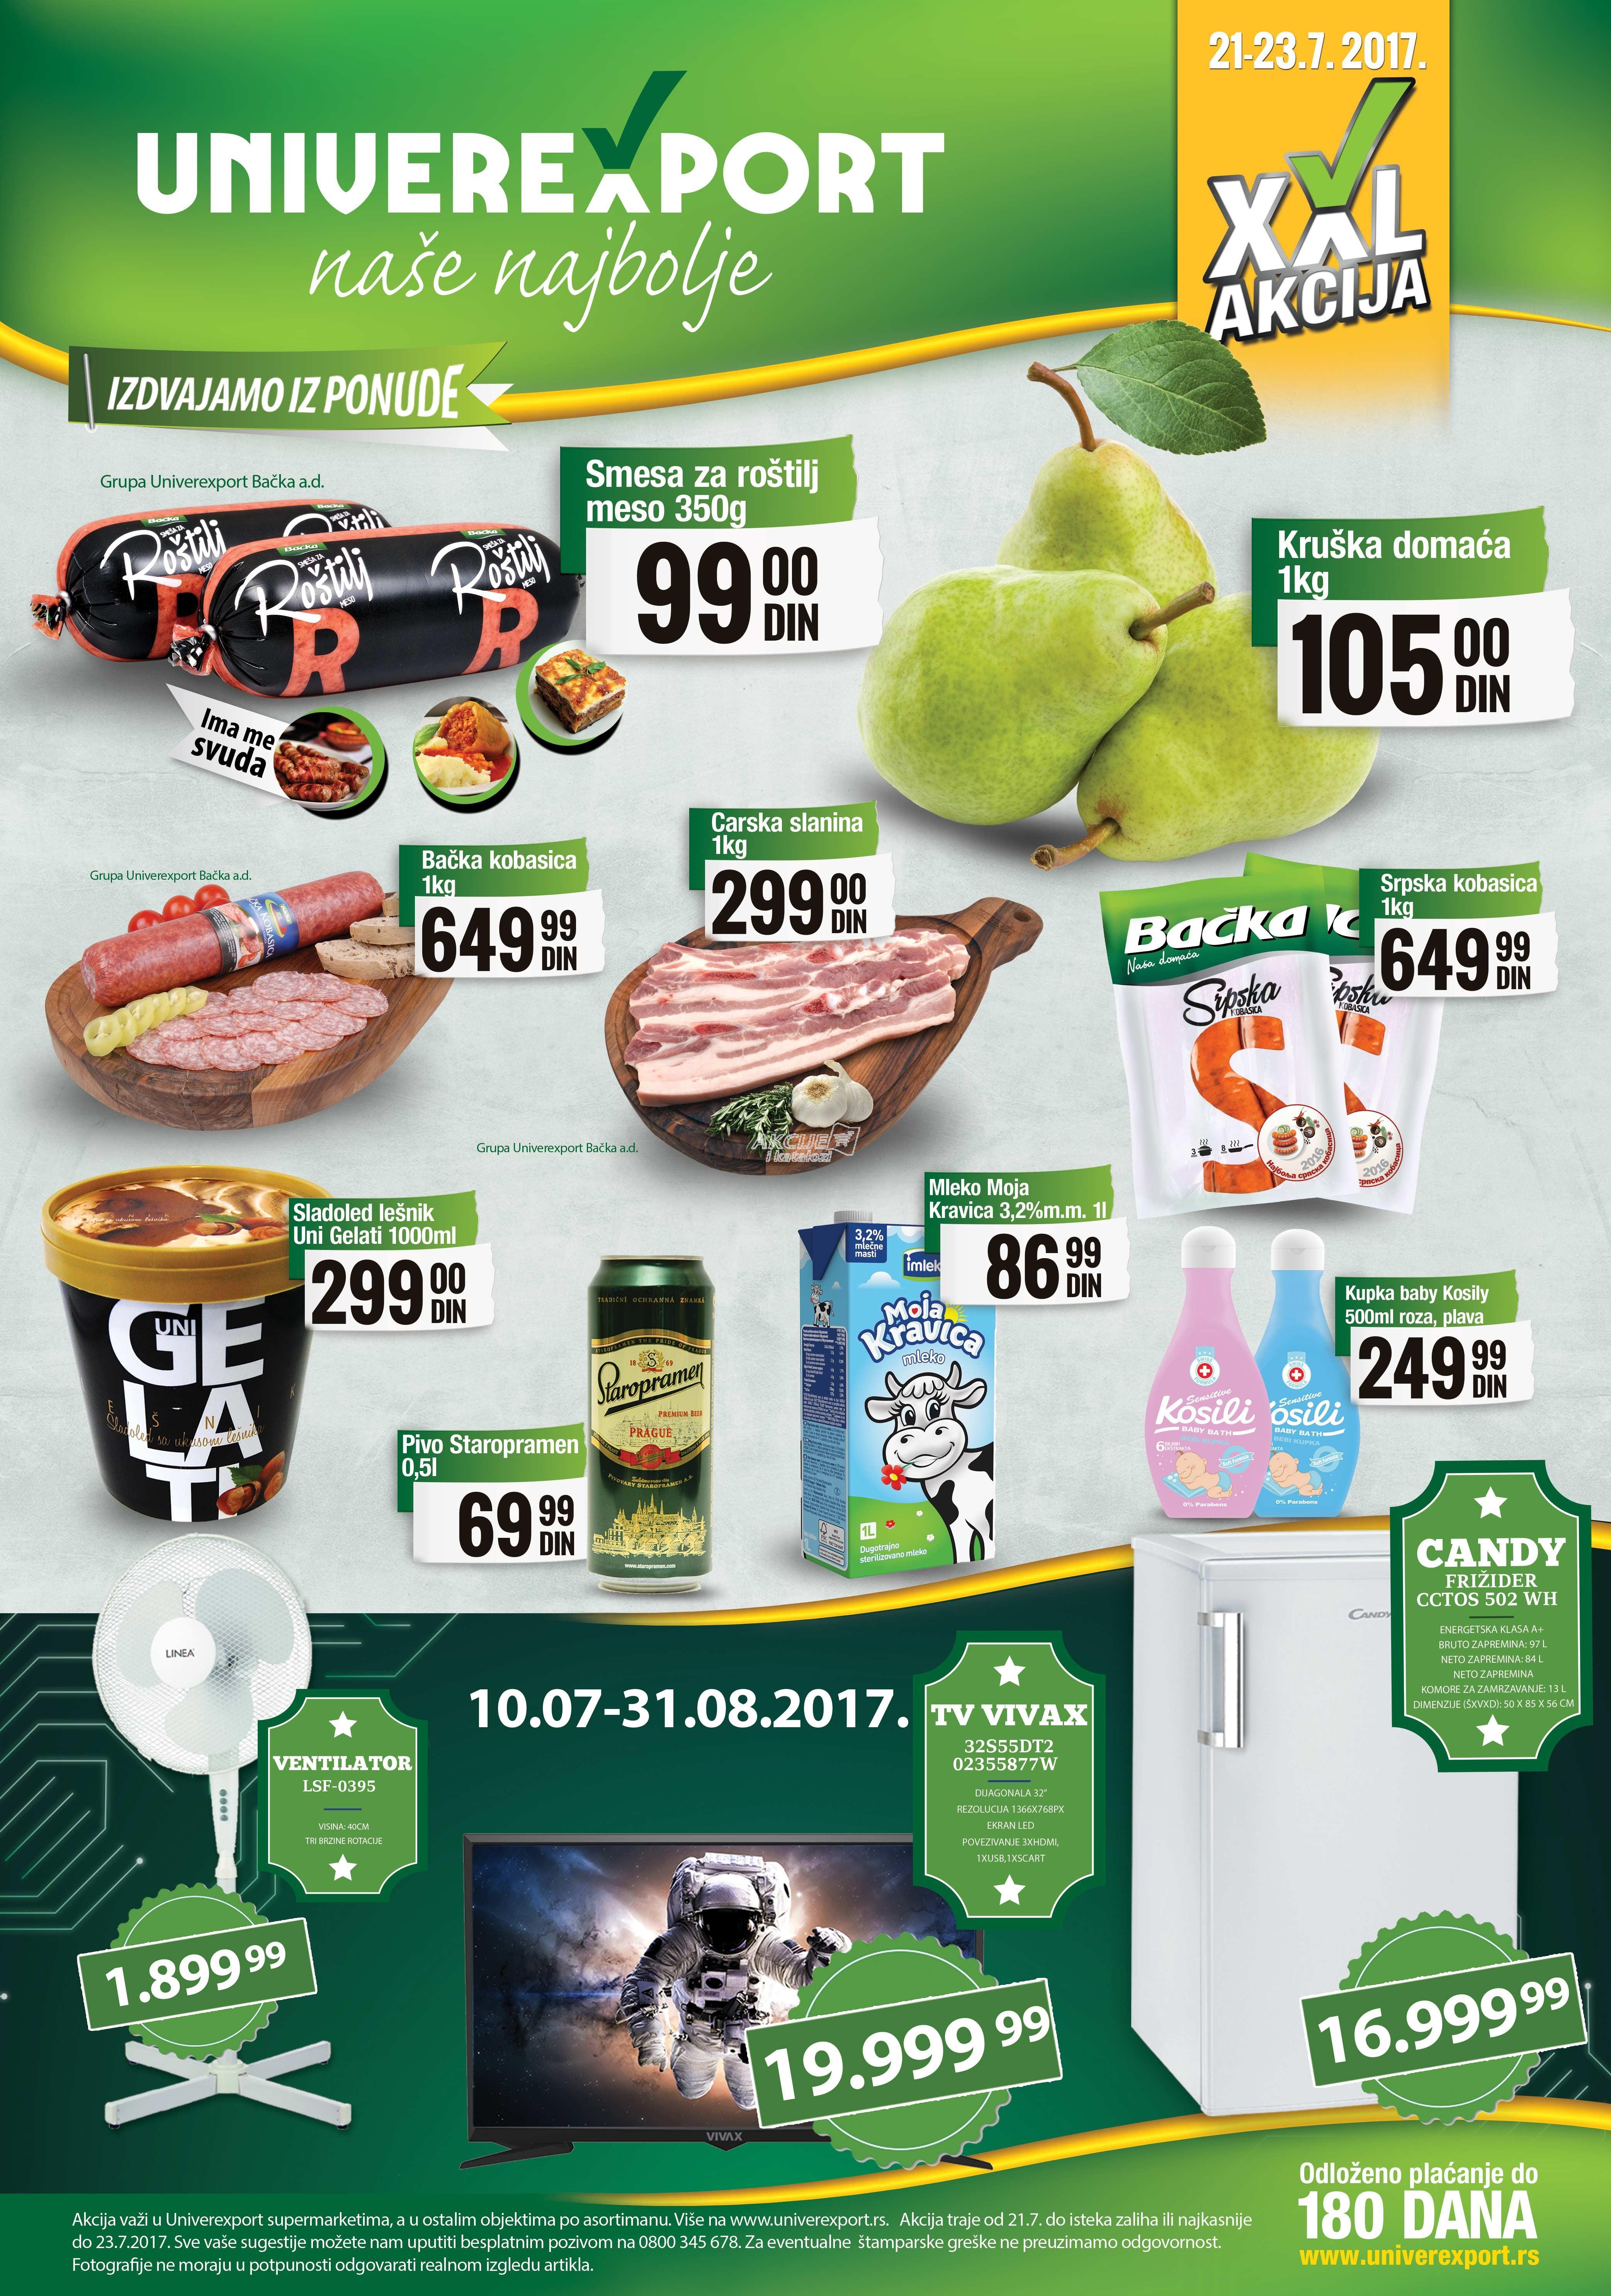 Univerexport vikend akcija nižih cena